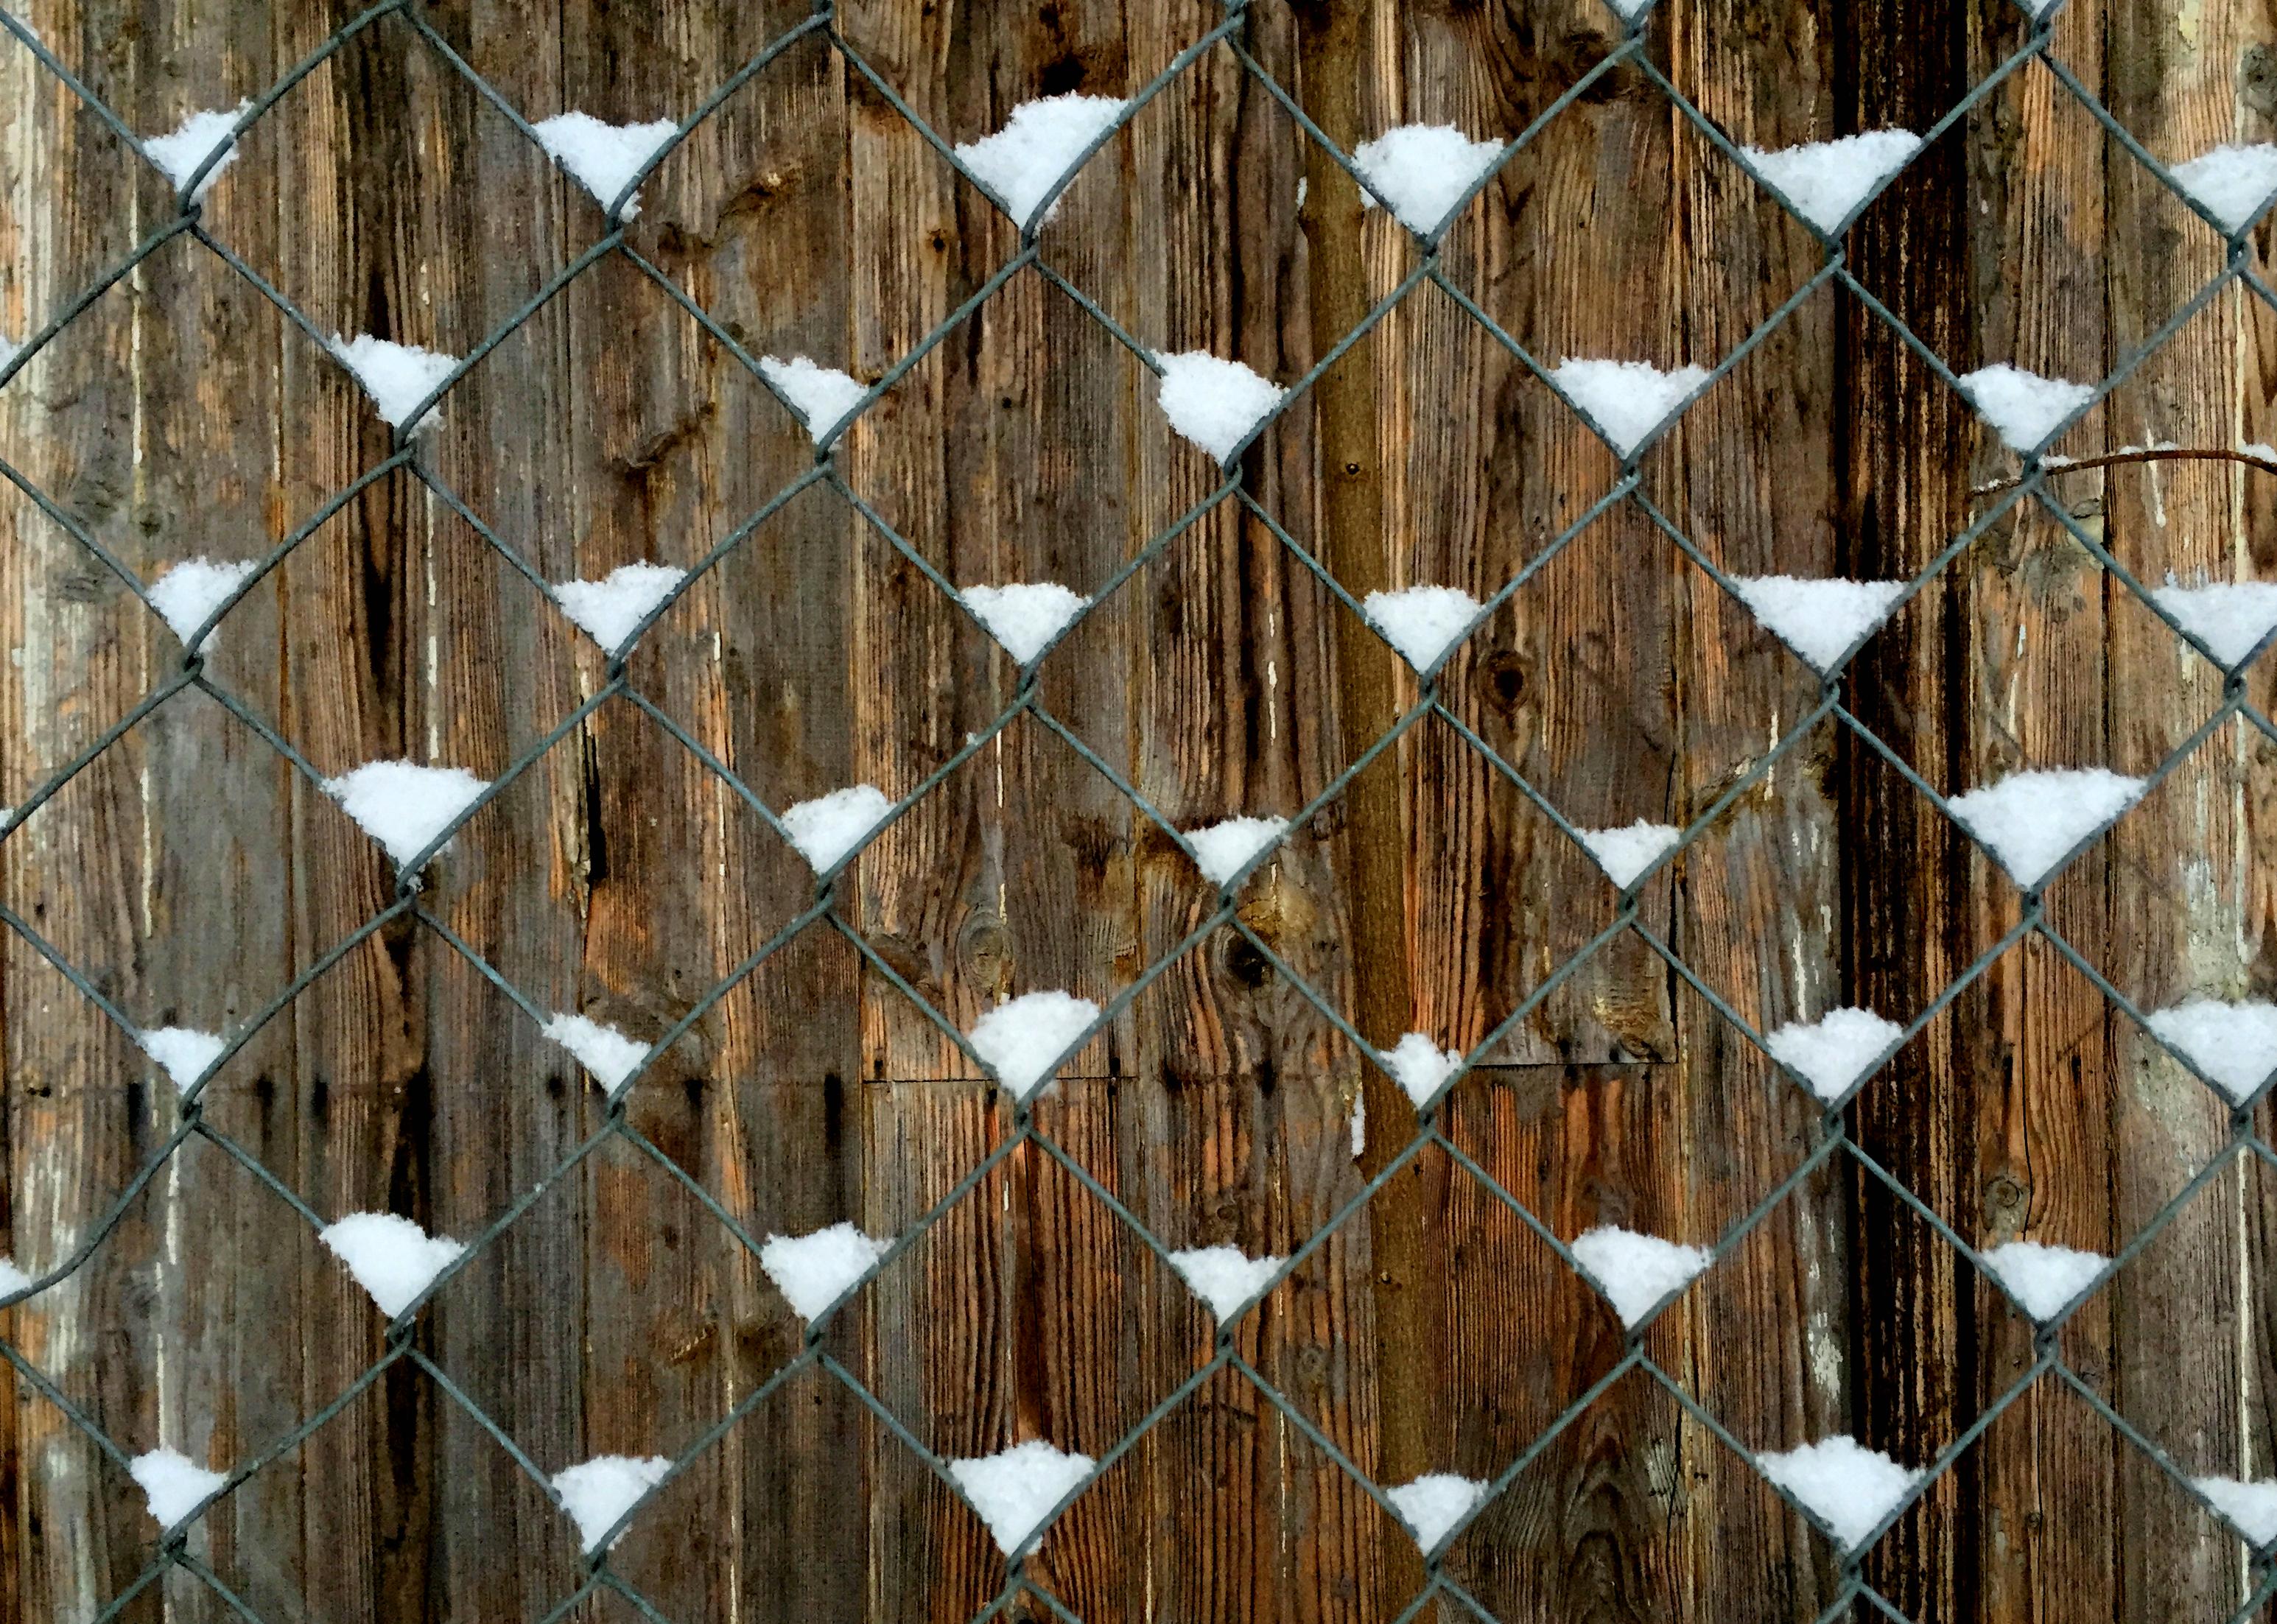 Wallpaper Wood Schnee Winter Snow Abstract Detail Texture